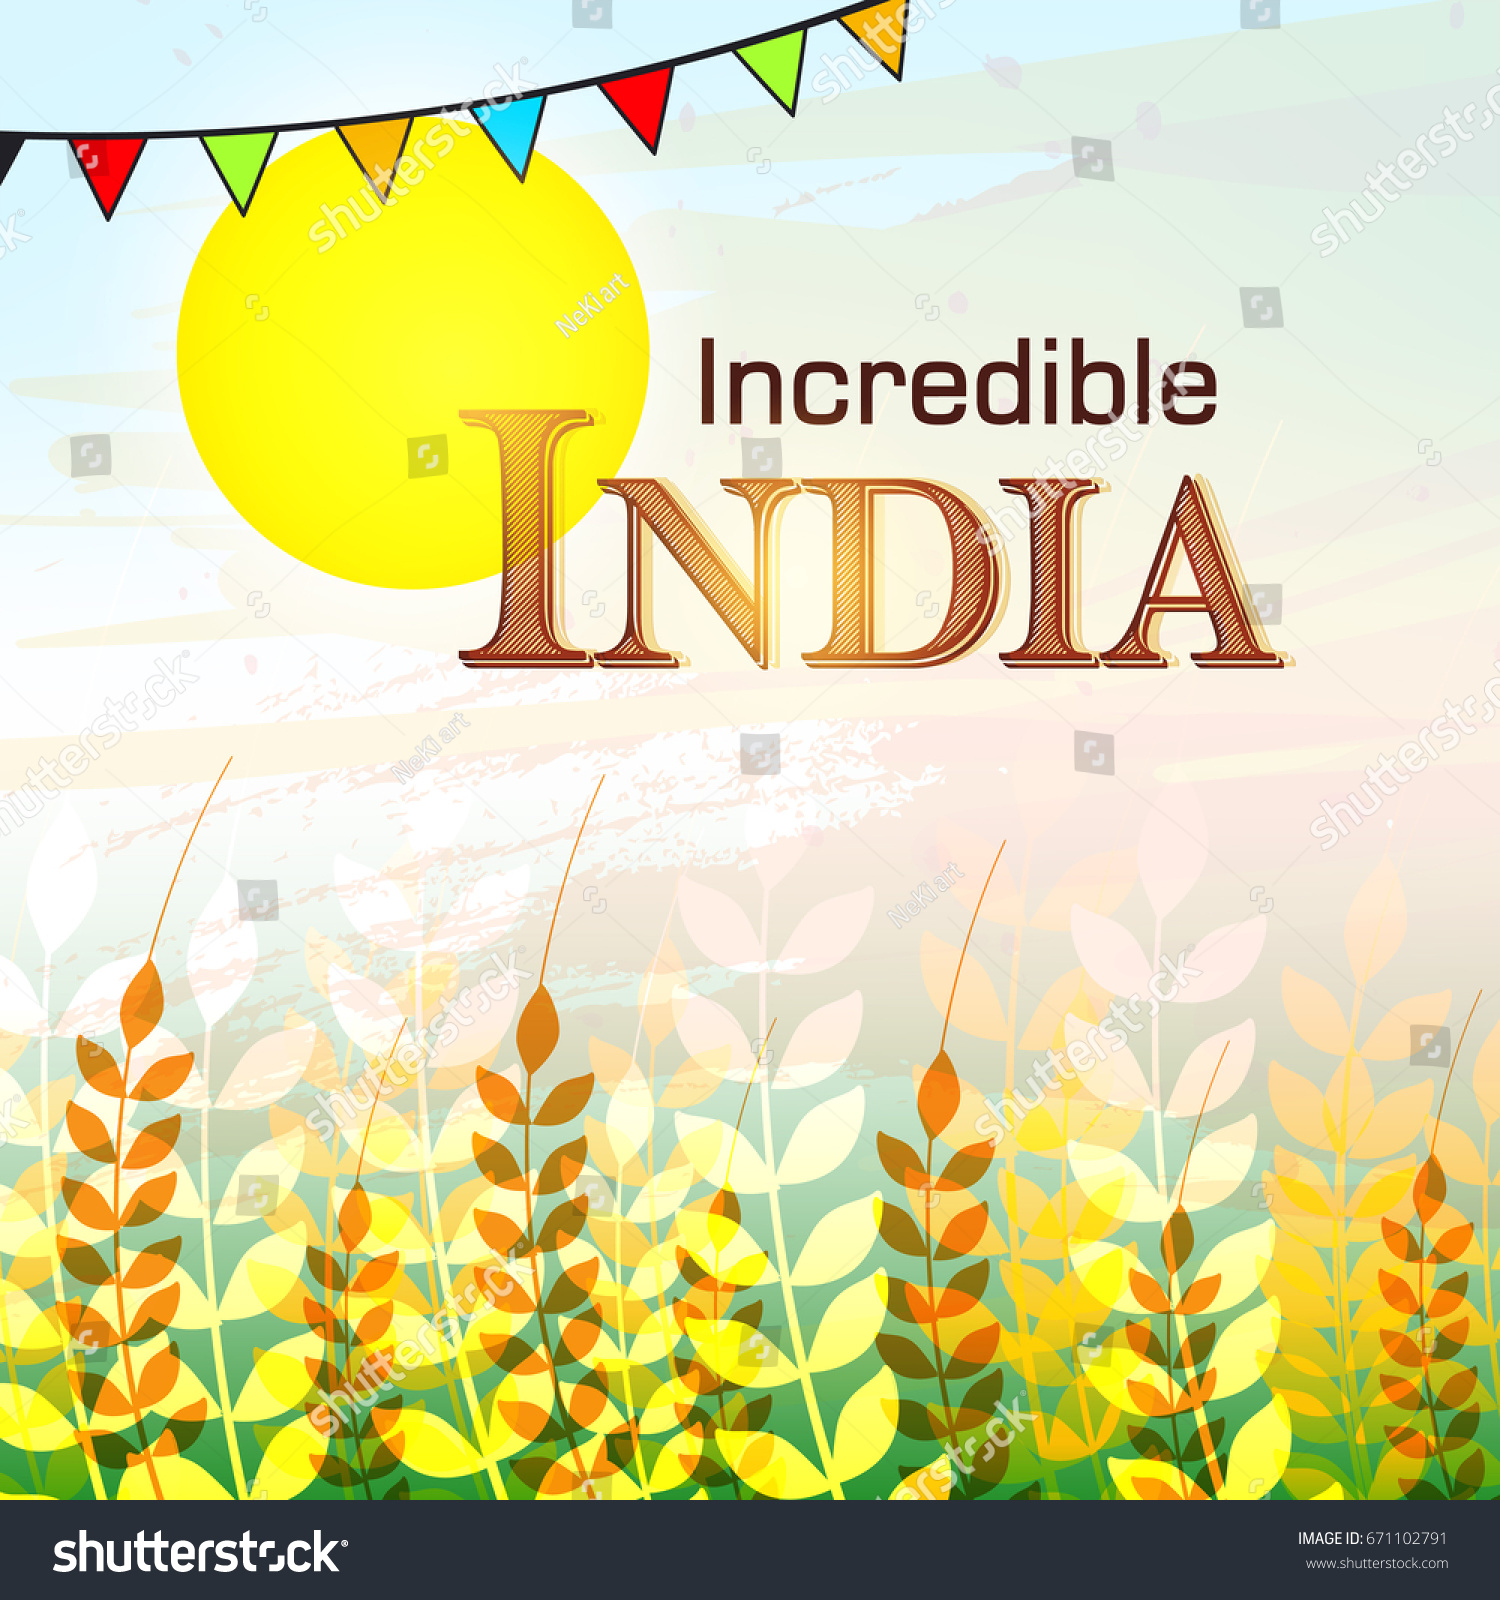 Incredible India Greeting Card Design 15 Stock Vector Royalty Free